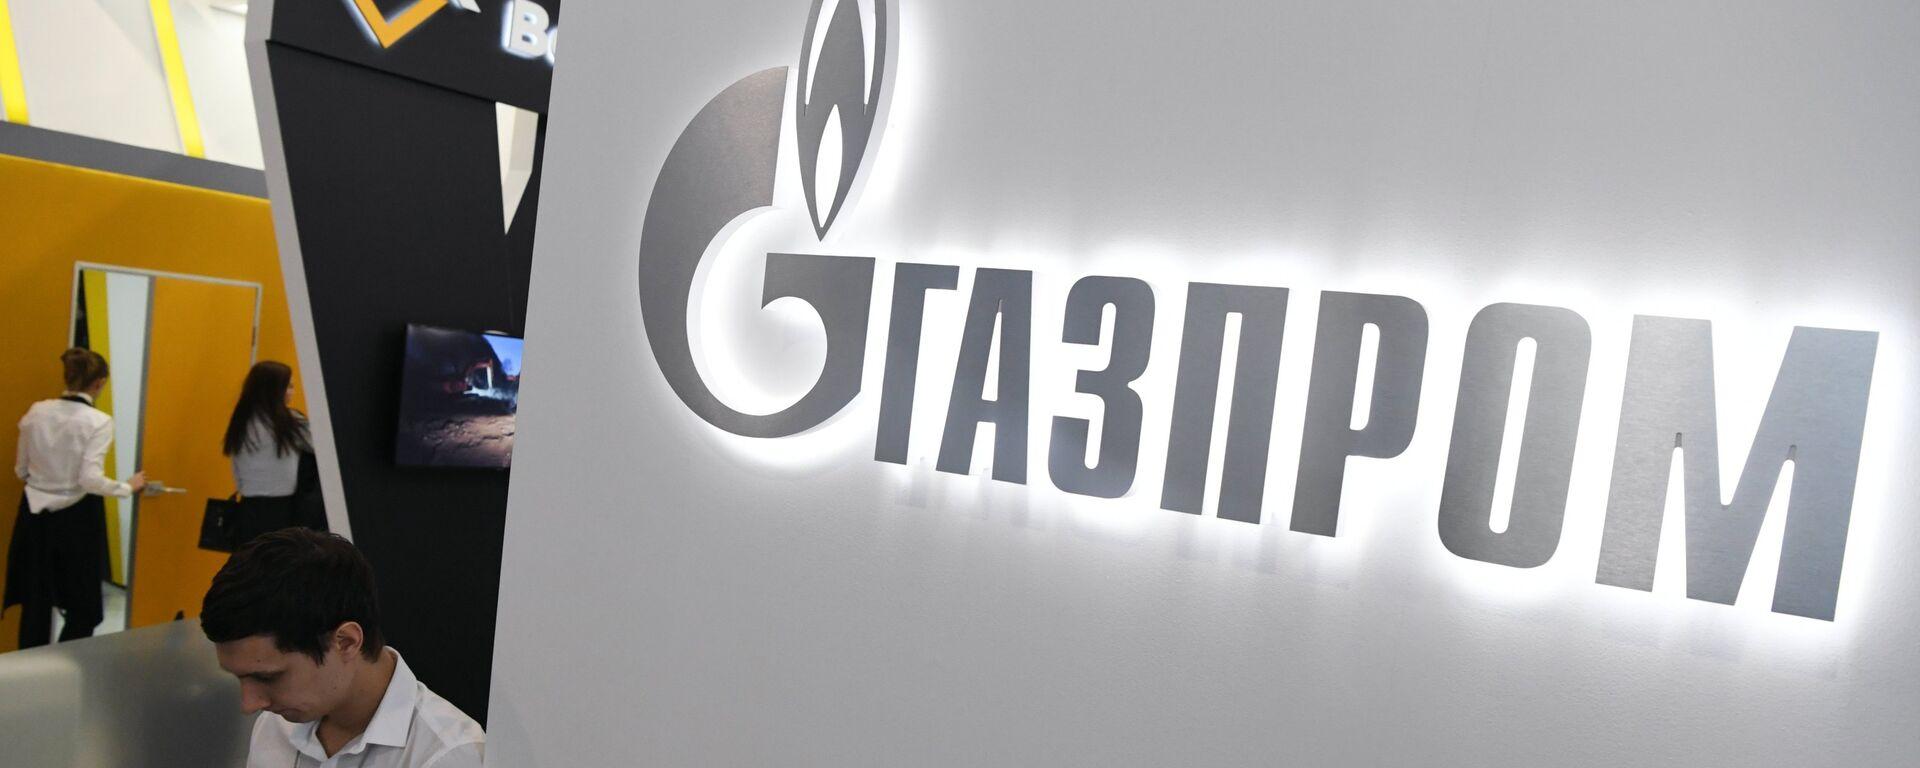 Logo de Gazprom - Sputnik Mundo, 1920, 28.09.2021